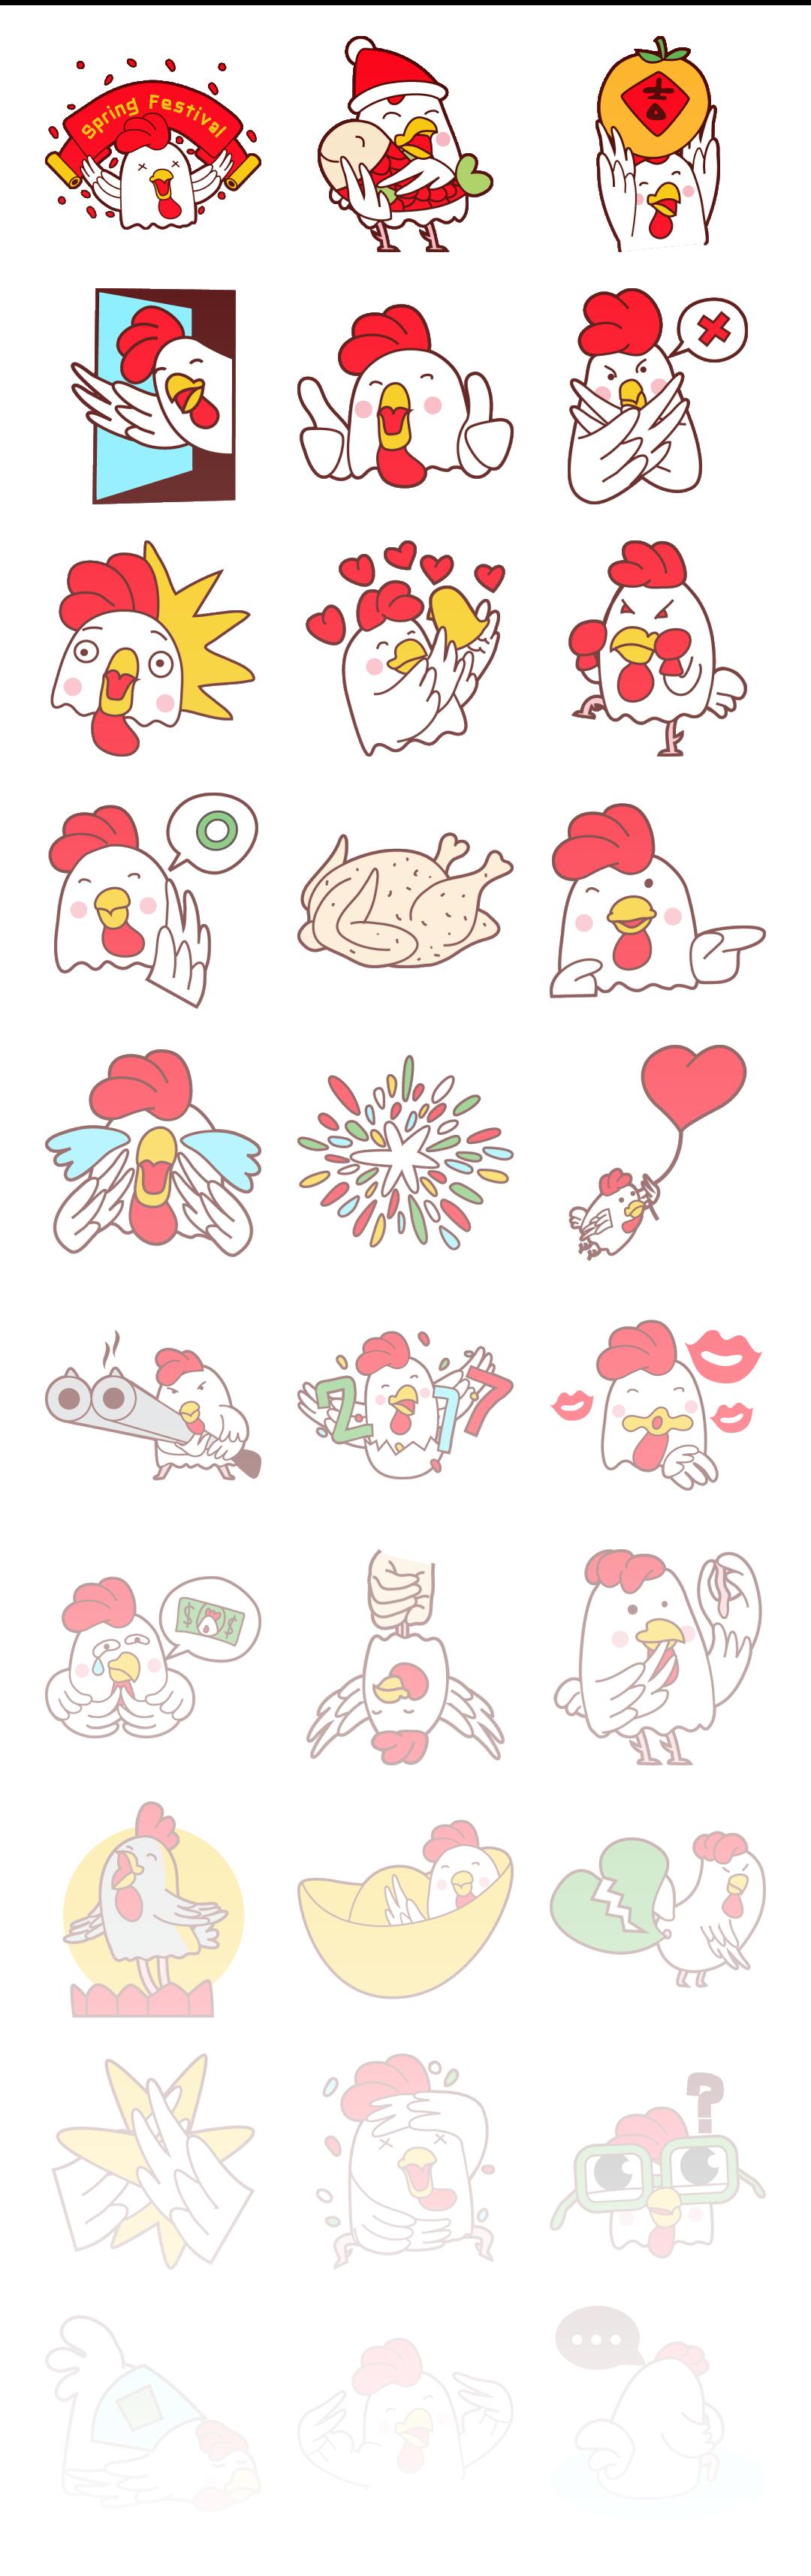 Spring Festival 2017 - Stickerpipe